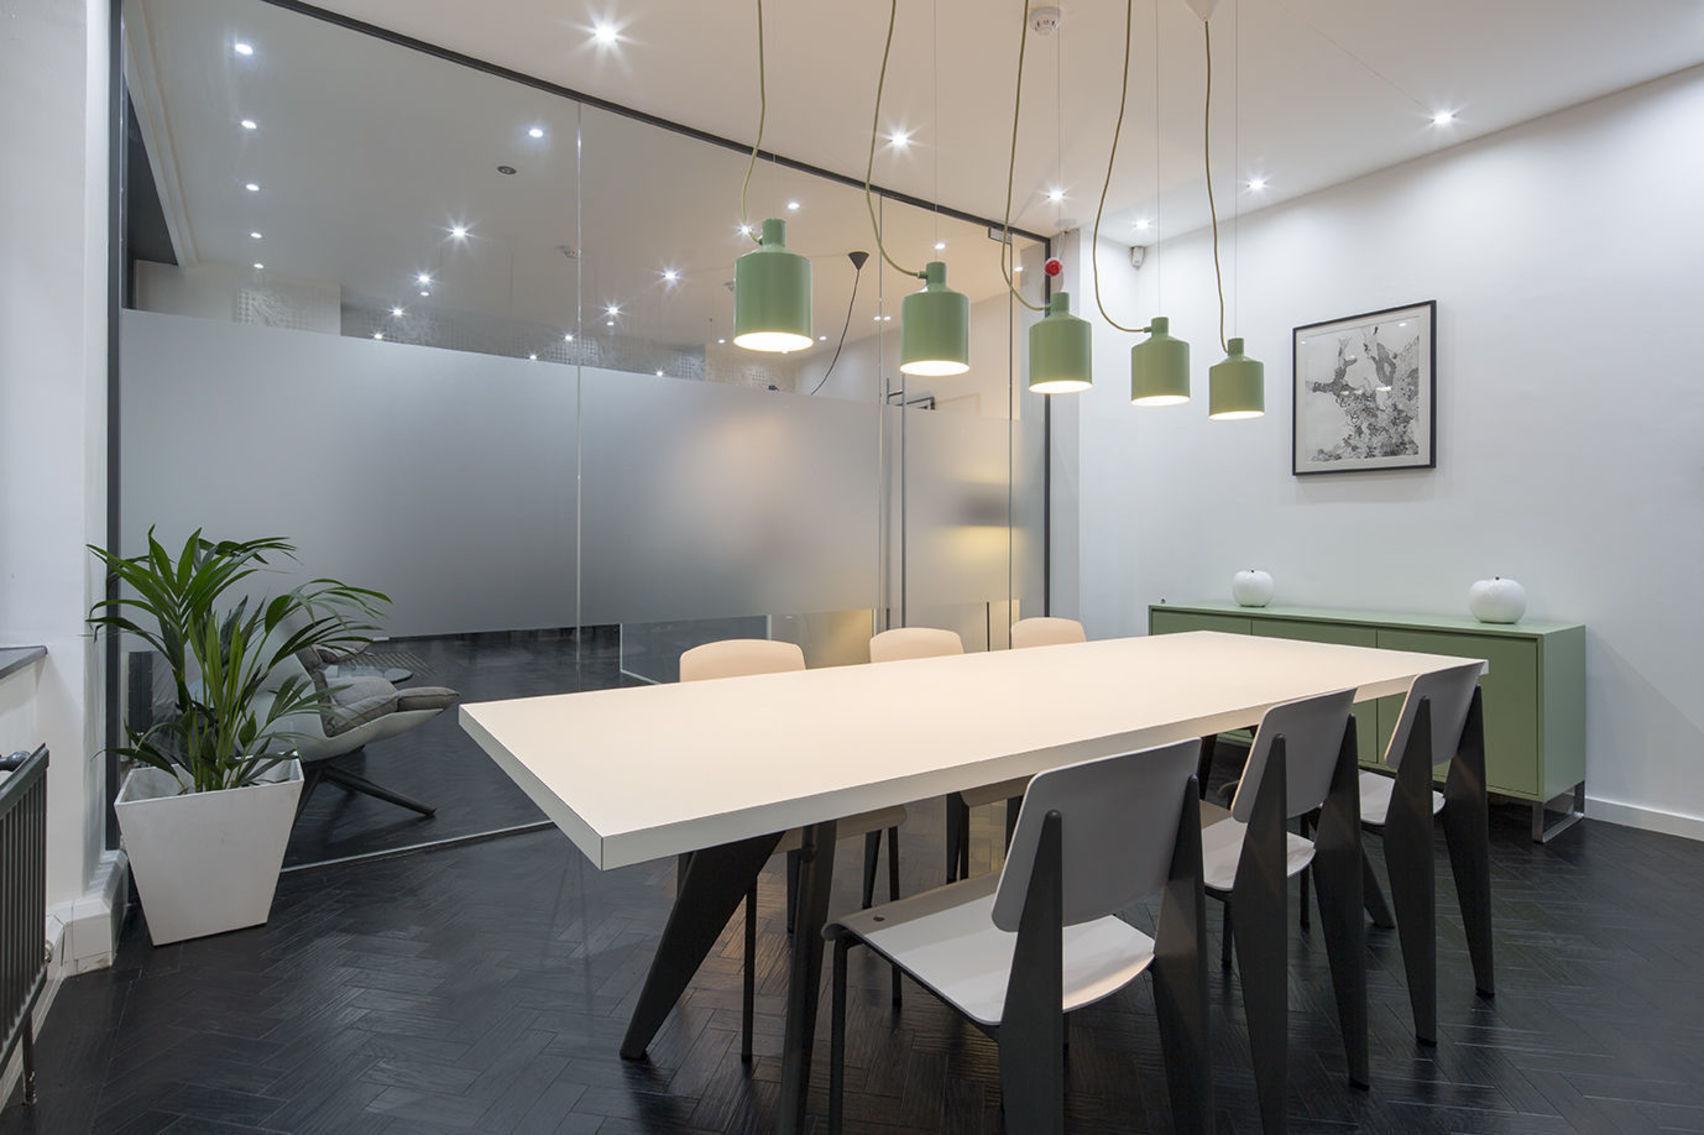 Whitefriars Meeting Room, Thirty-Six Whitefriars Street